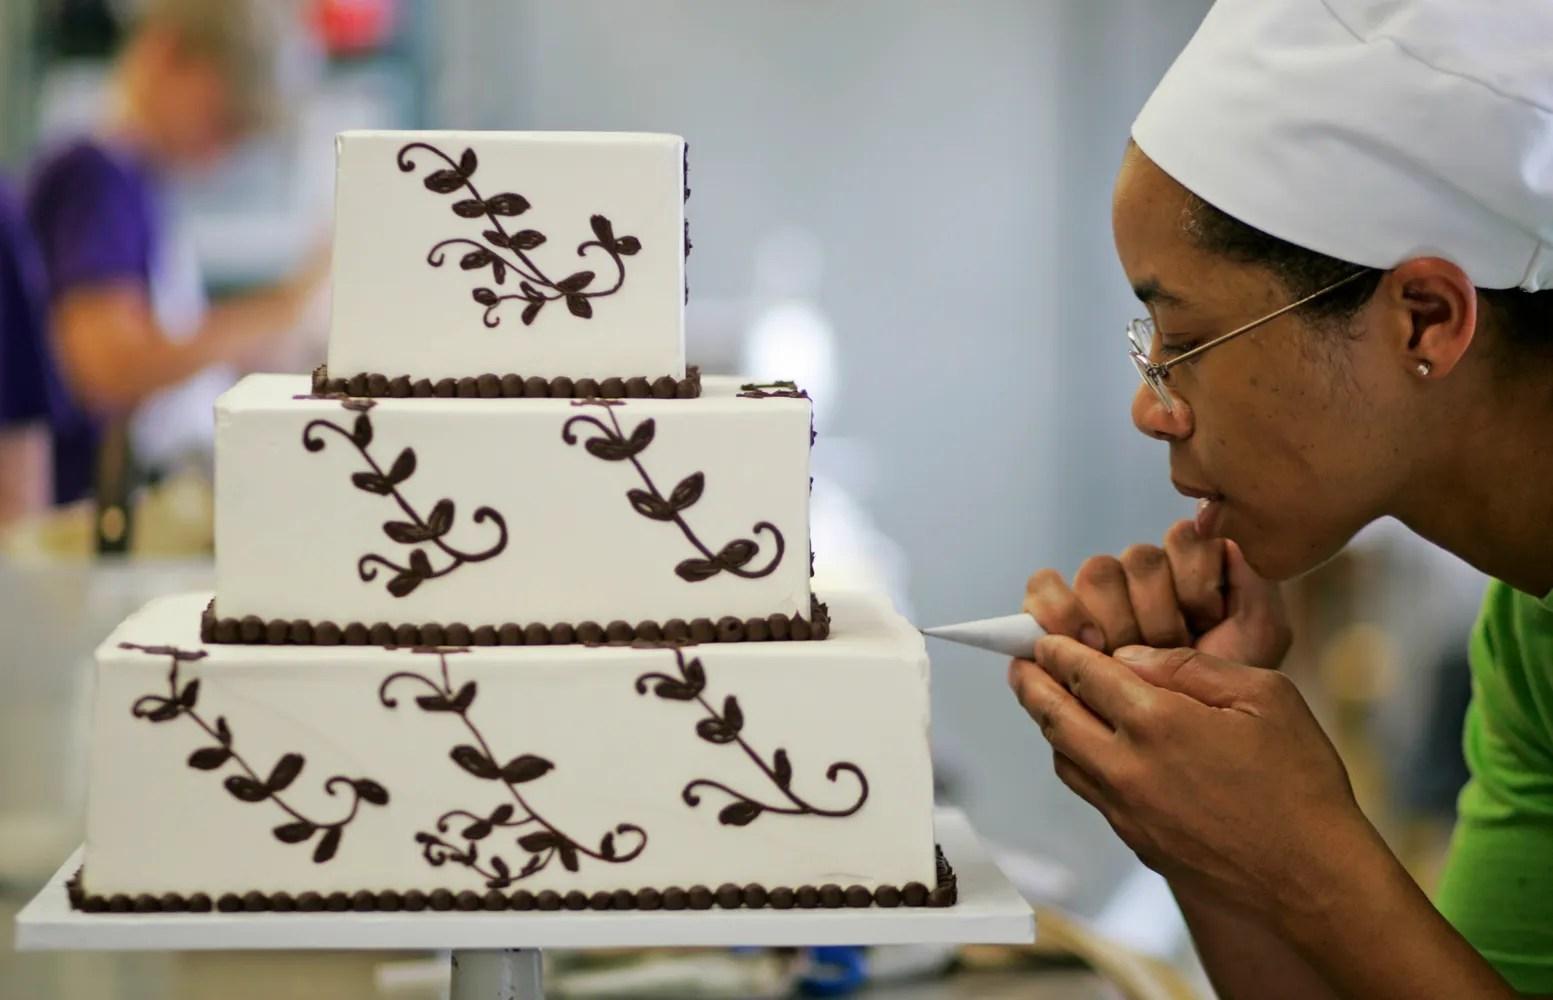 Bakery Birthday Cakes Sweetjazmines Com Berwyn Pennsylvania